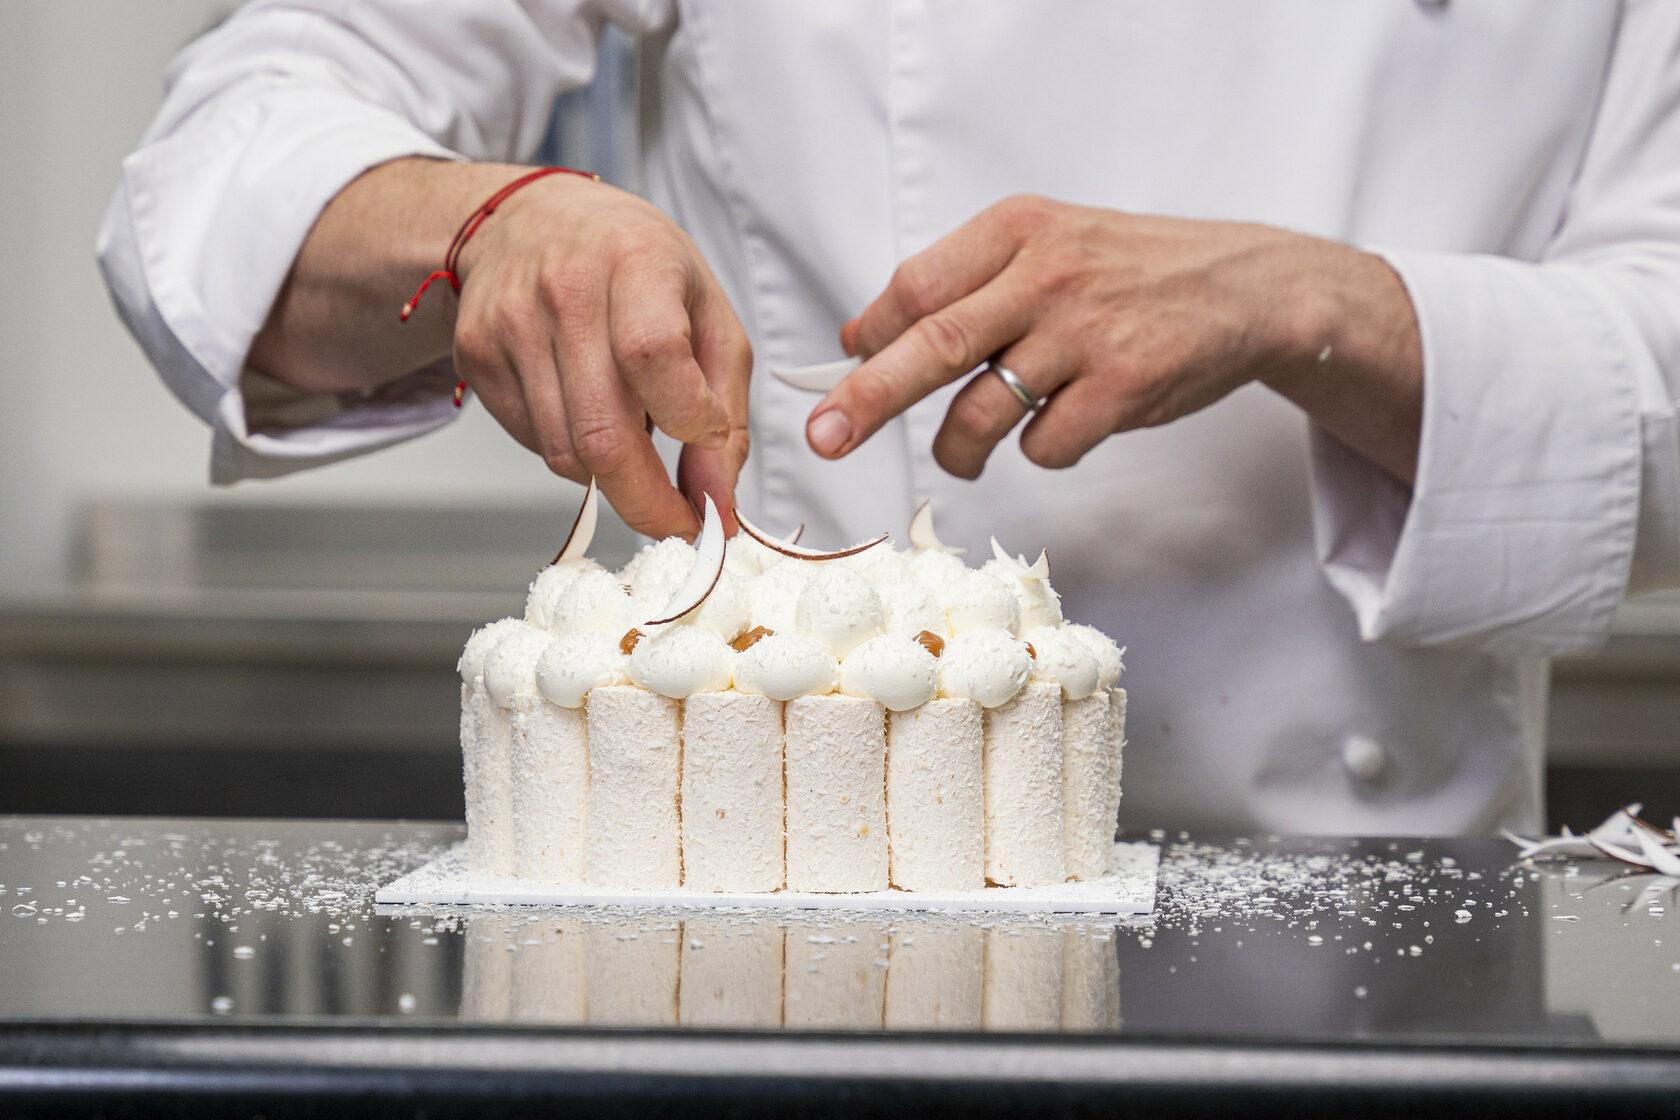 NICOLAS LAMBERT DECORATE THE CAKE